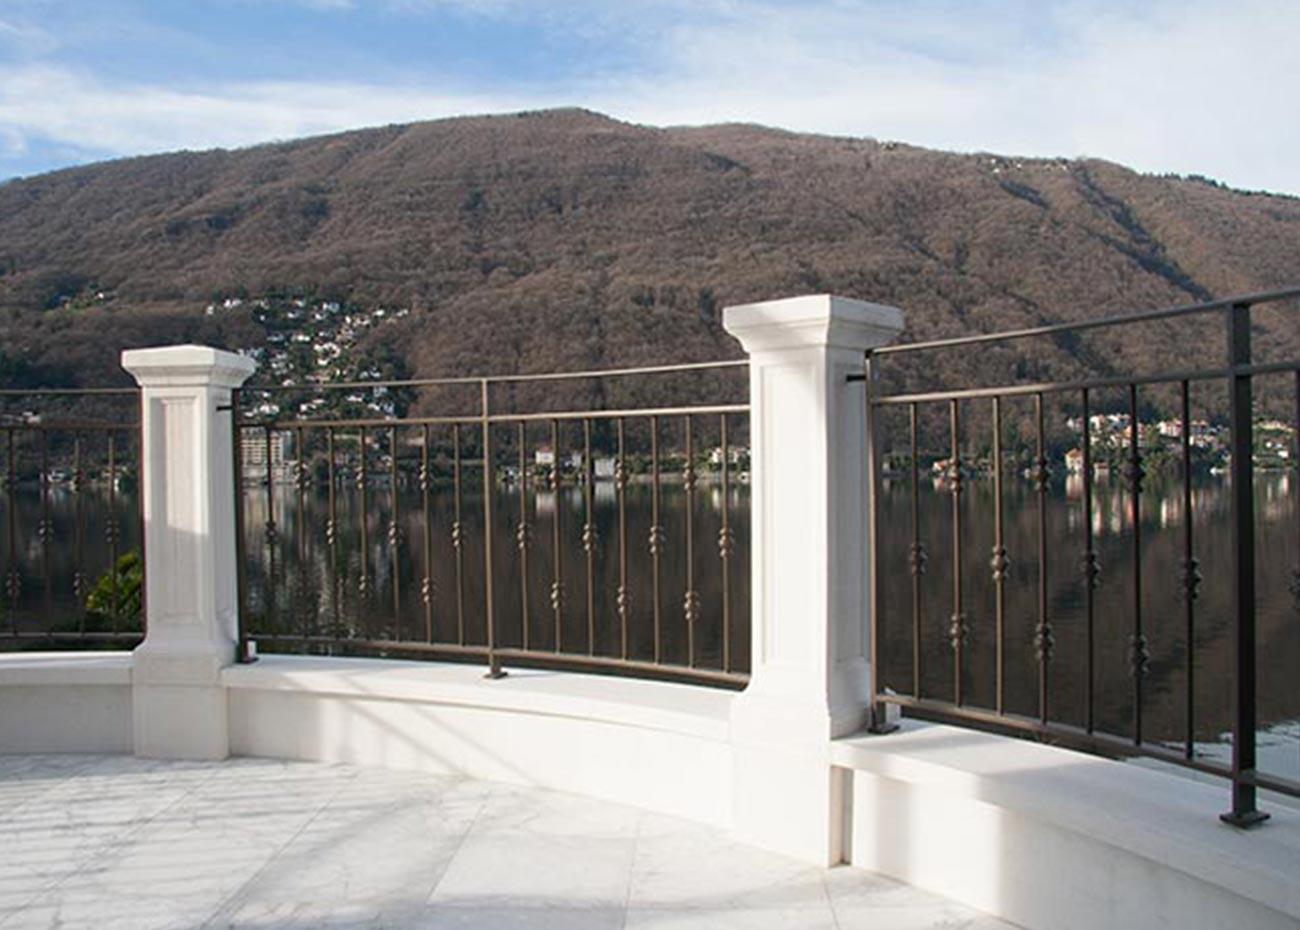 terrazzo-in-marmo-mgm-la-marmoteca